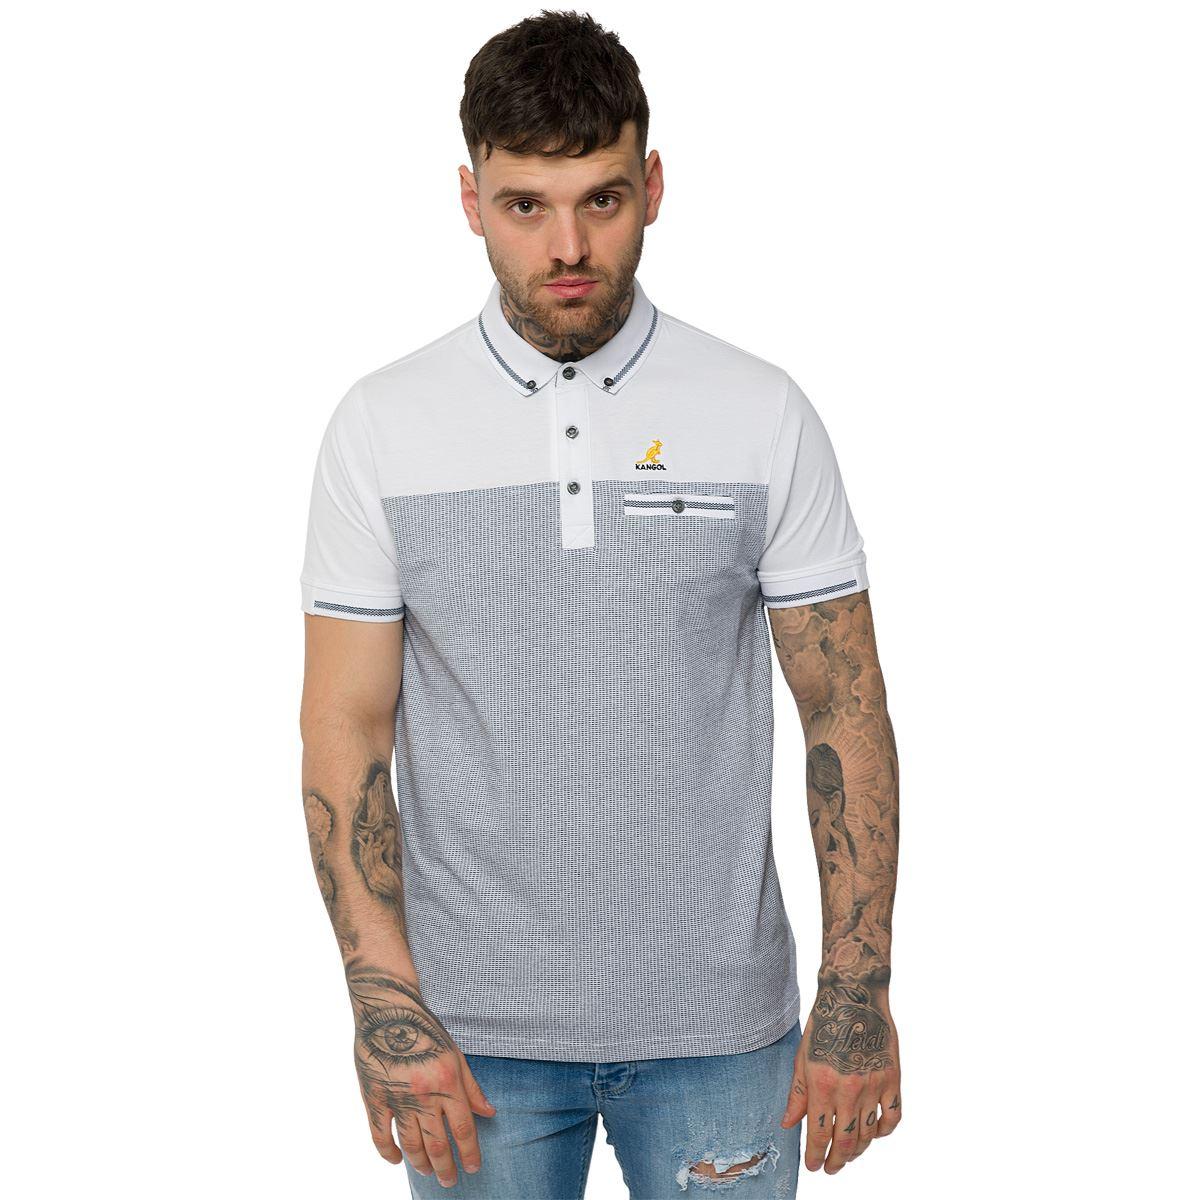 Kangol mens casual cotton polo shirt designer short sleeve for Xxl mens polo shirts